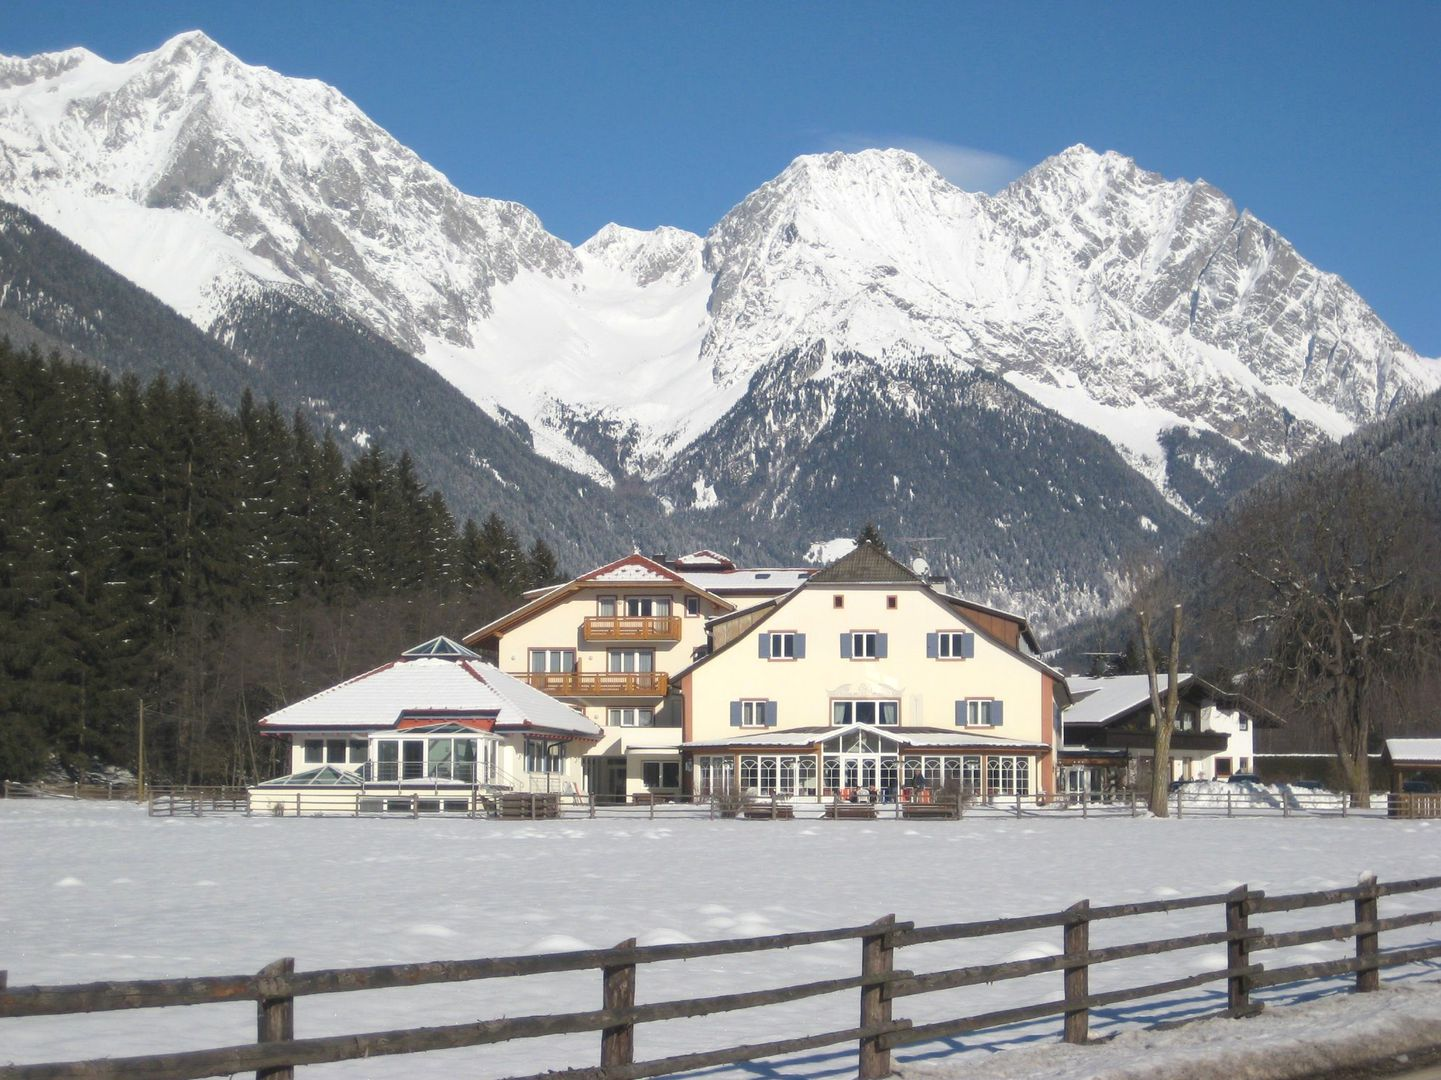 Hotel Bad Salomonsbrunn